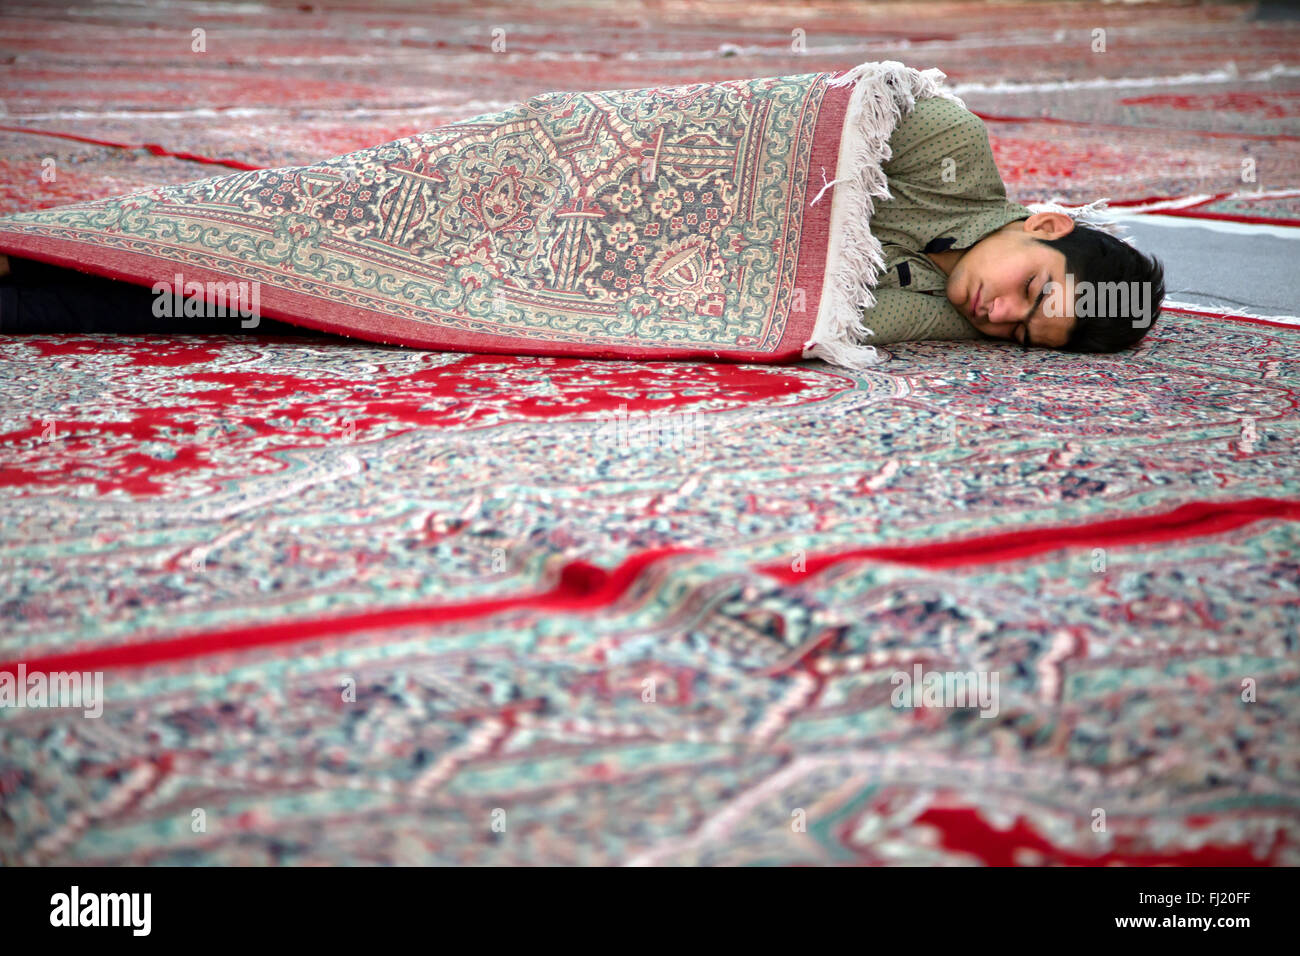 Man sleeping enveloppé dans un tapis en Iran dans le mausolée de l'Ayatollah Khomeini, Téhéran, Photo Stock